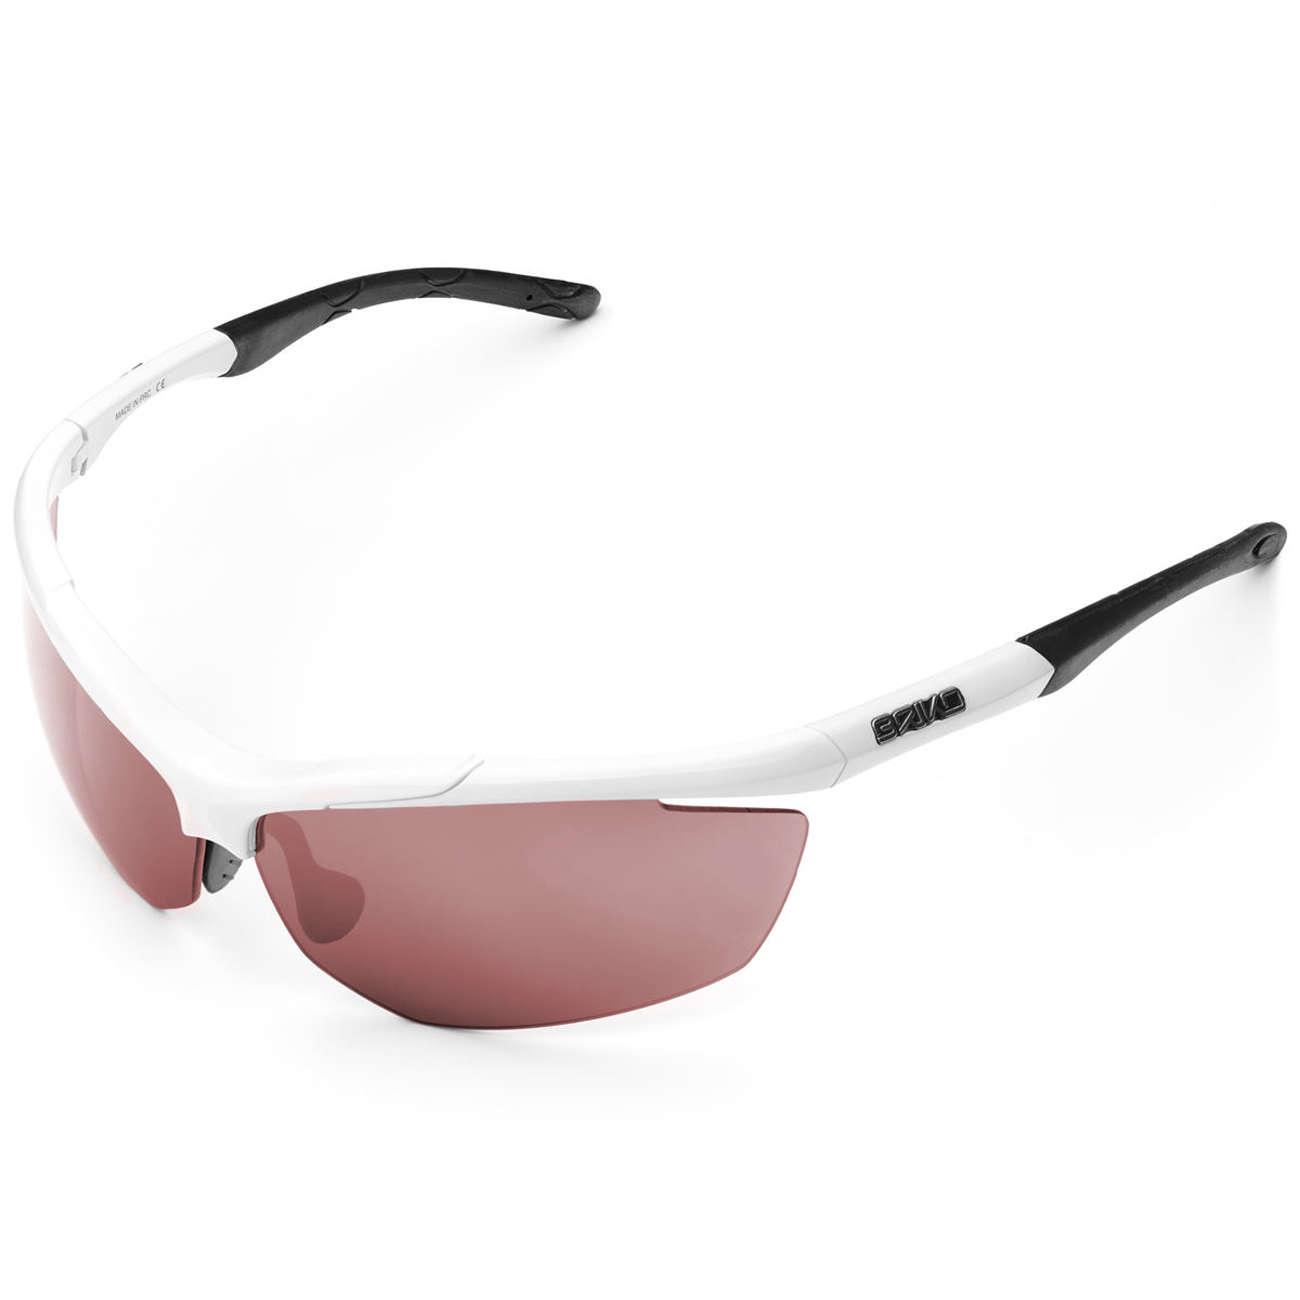 57a4aeb521a Briko Trident Photo Sportbril Wit met met Photochromic Pink Lens ...